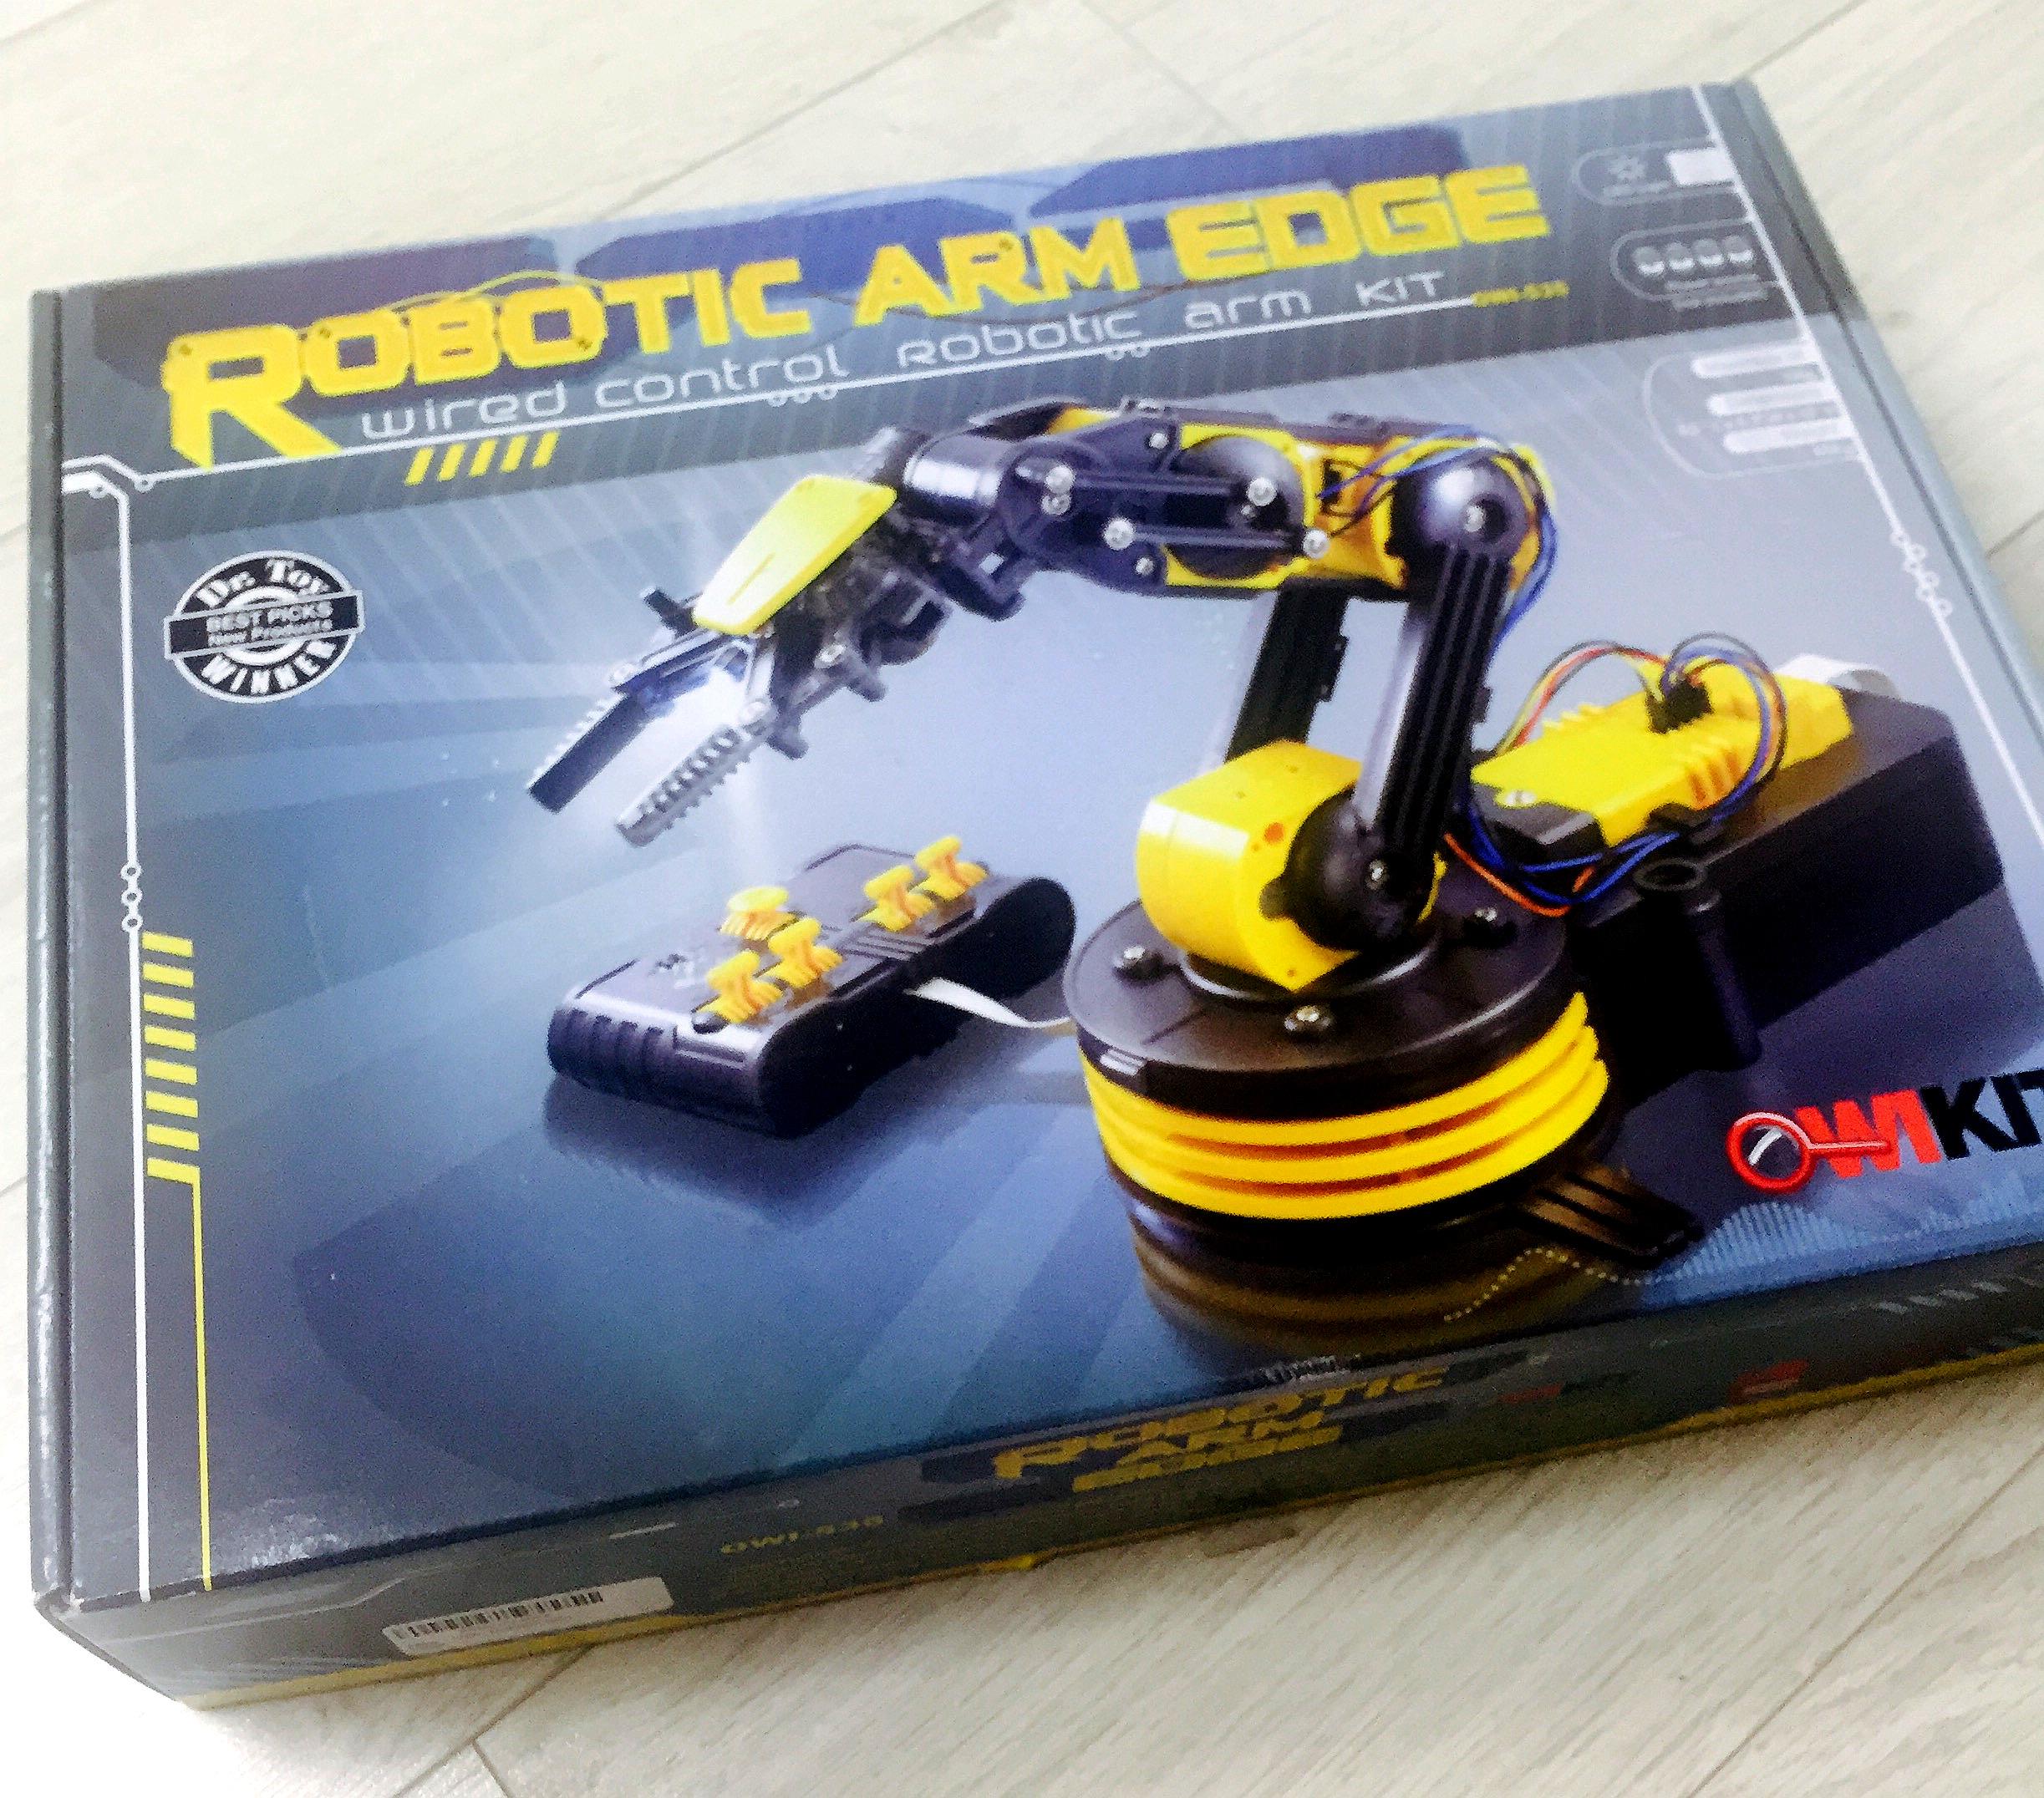 OMI Robotic Arm Edge